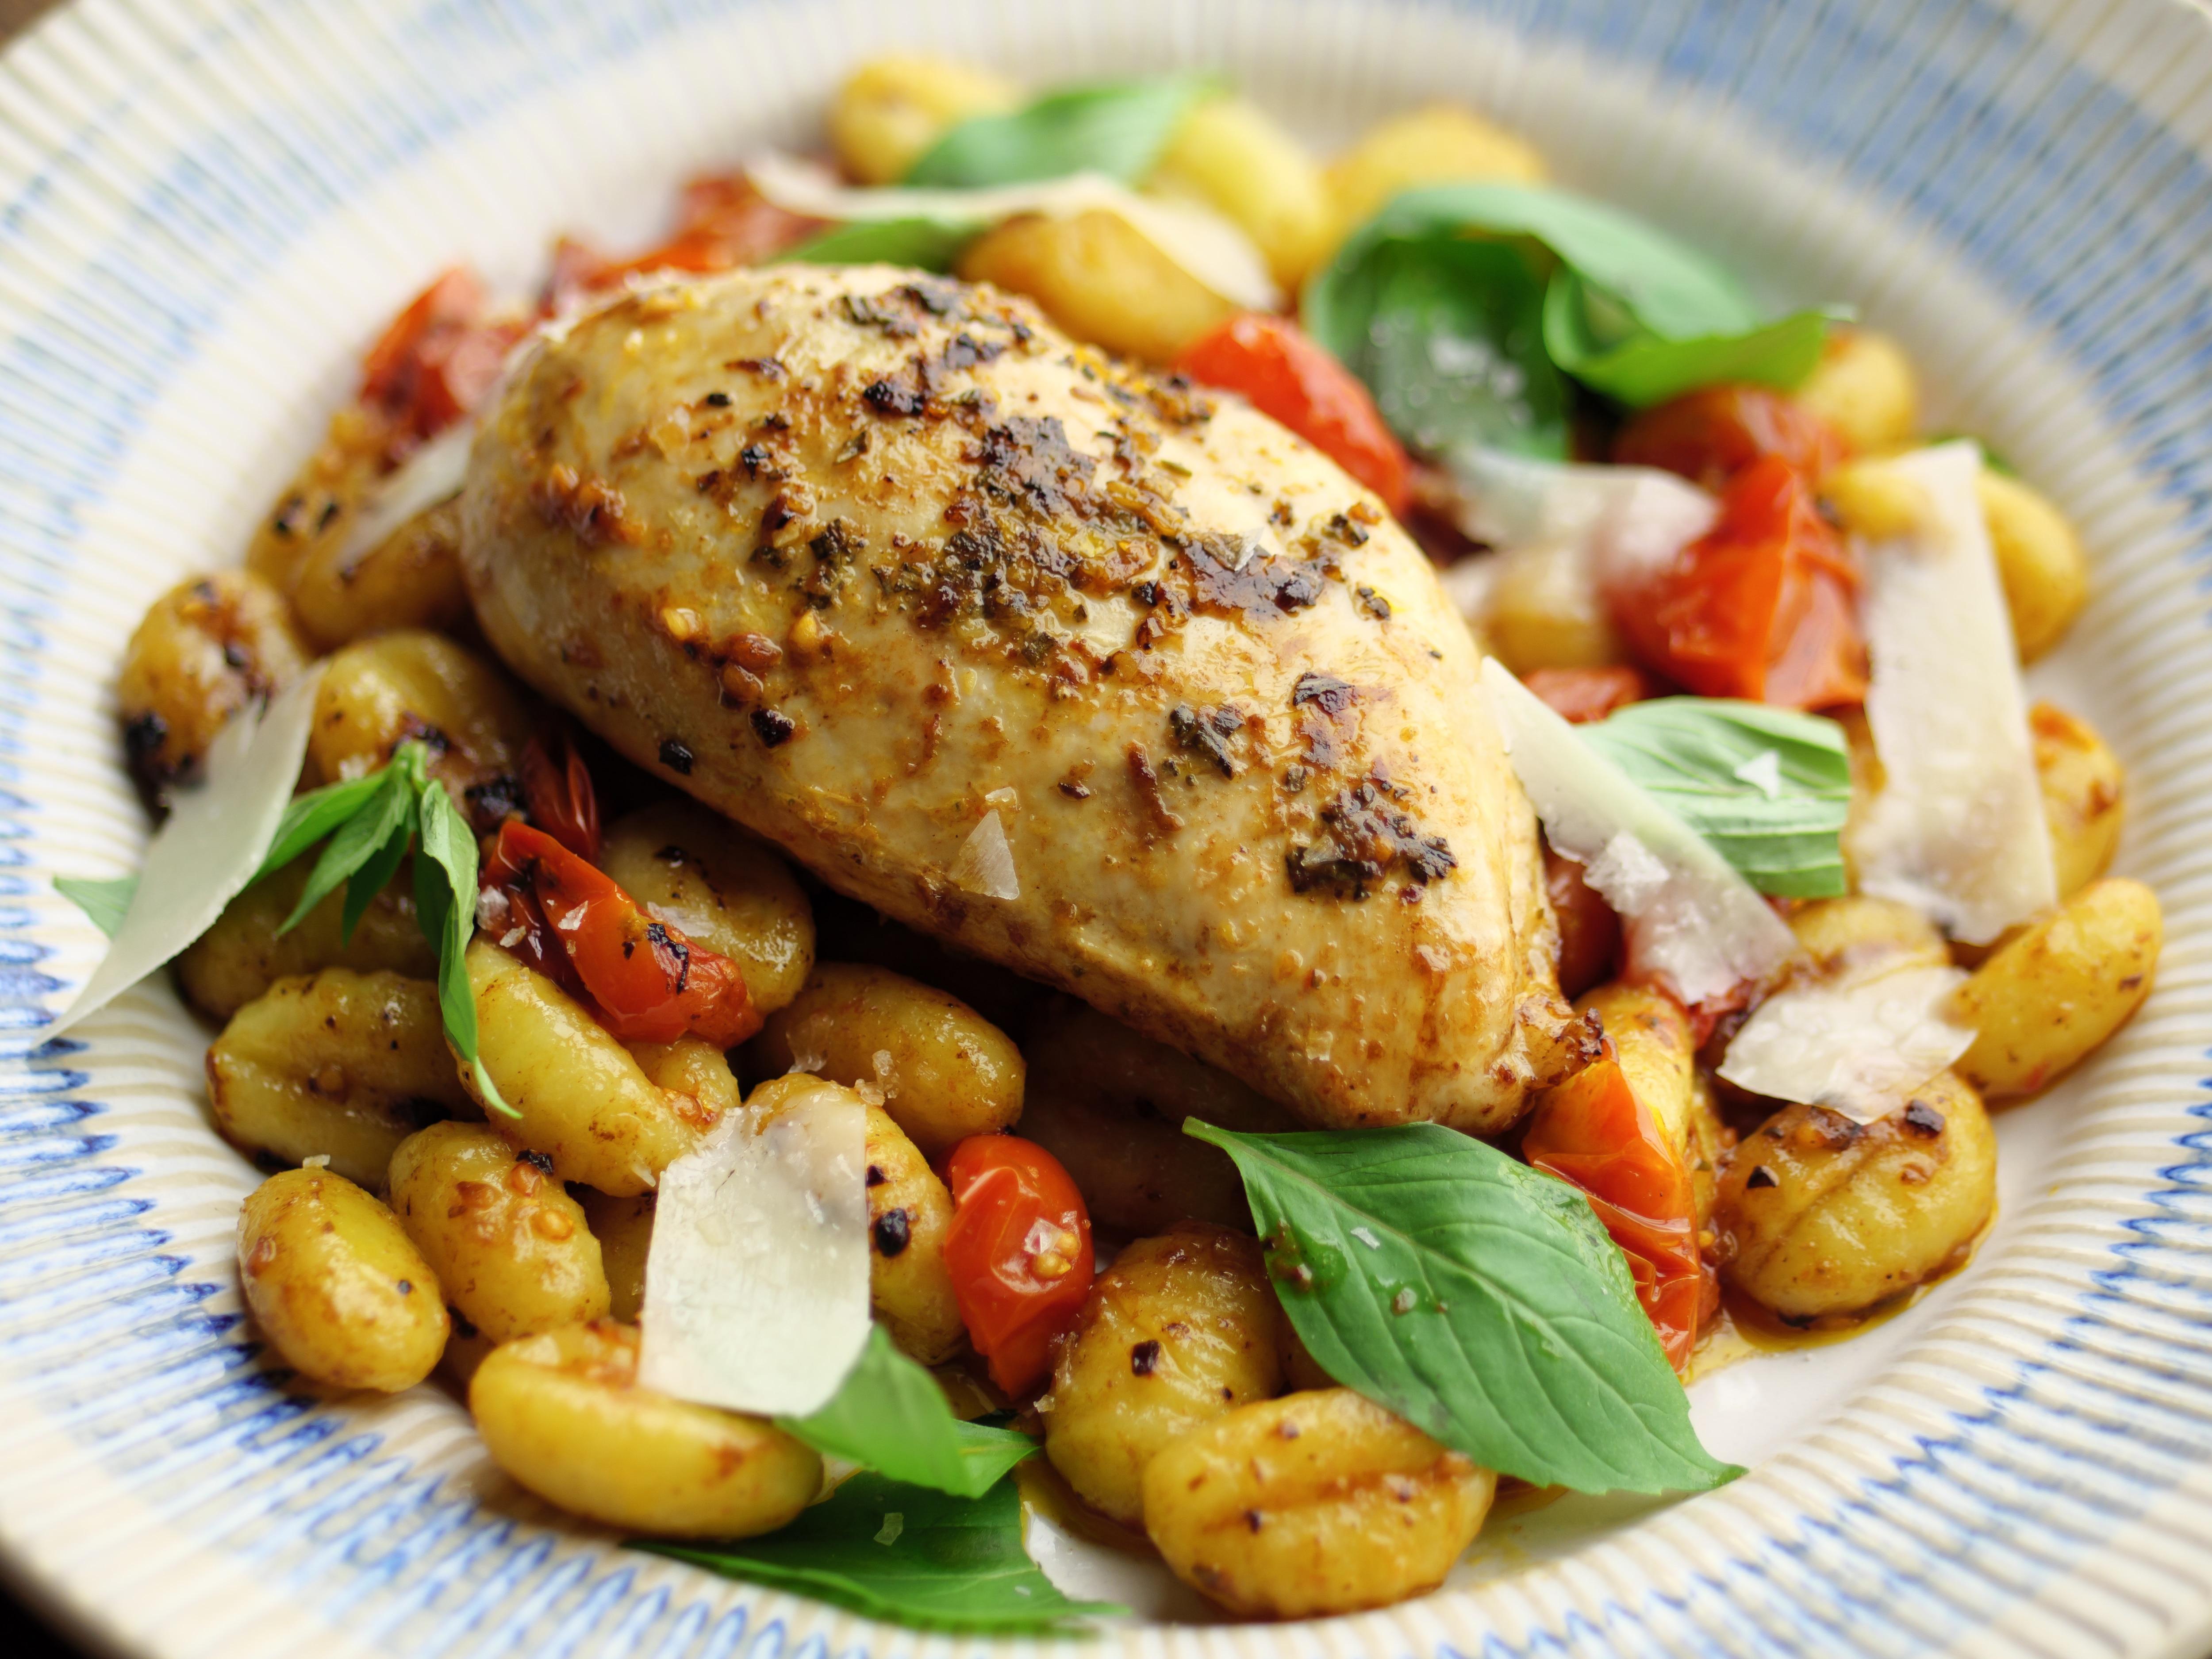 Garlic & Rosemary Chicken With Tomato Gnocchi